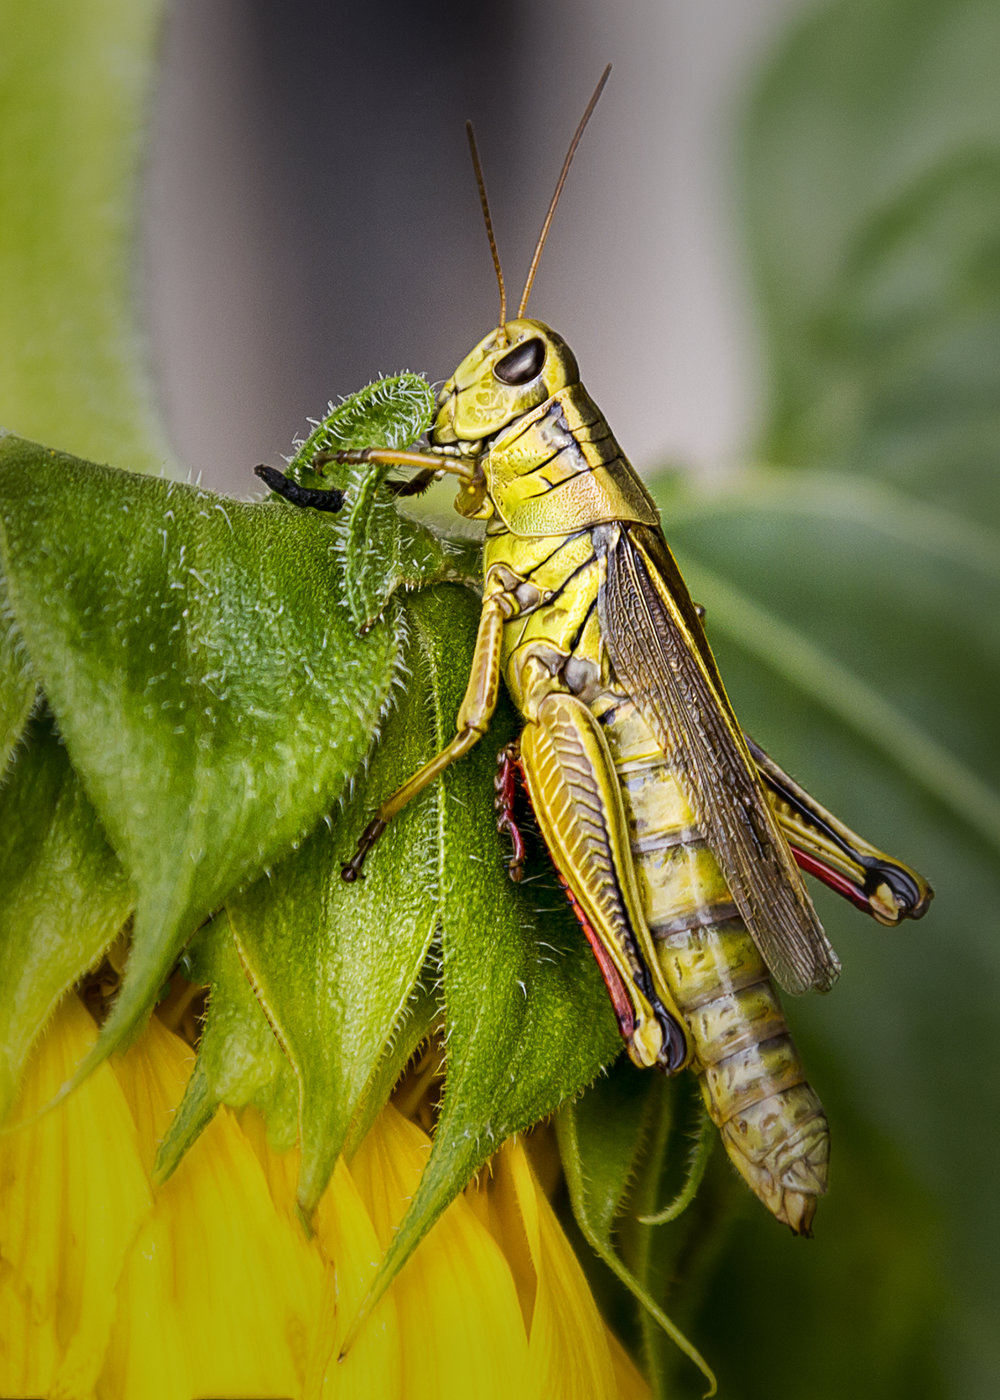 4131~COP~Grasshopper~Zuidema~Bonnie~FVC.jpg